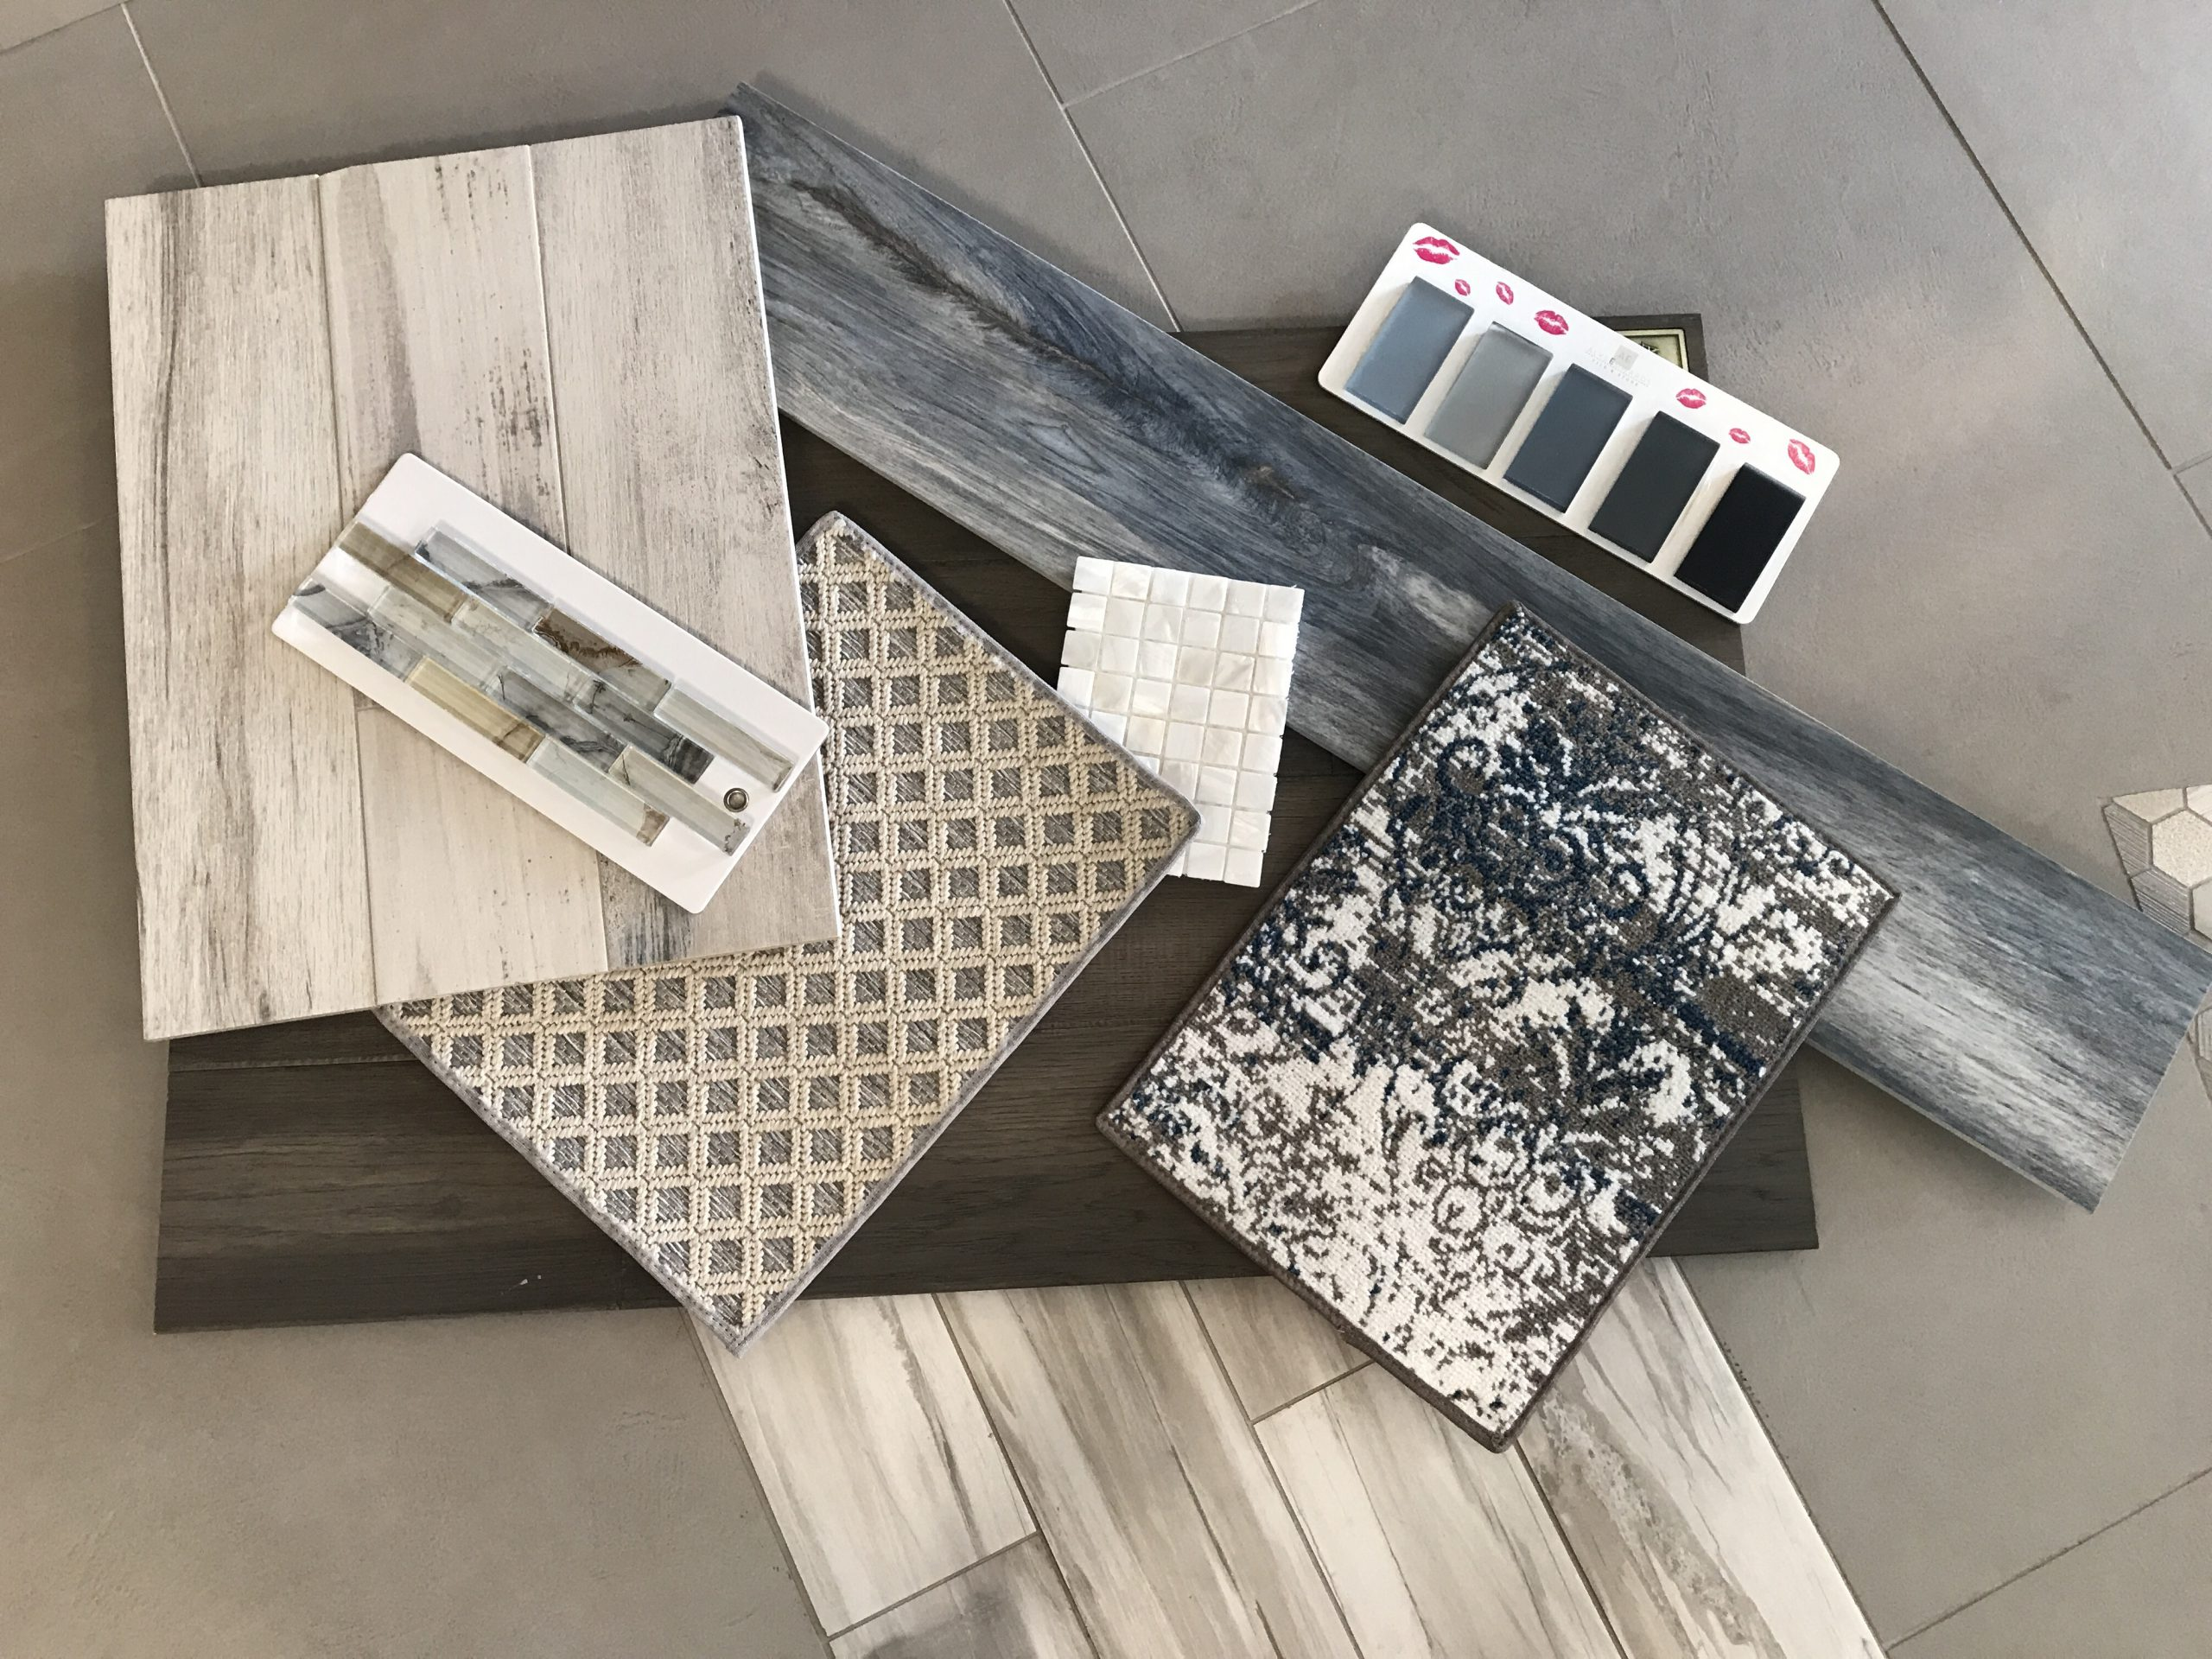 Flooring Ideas: Carpet and Tile